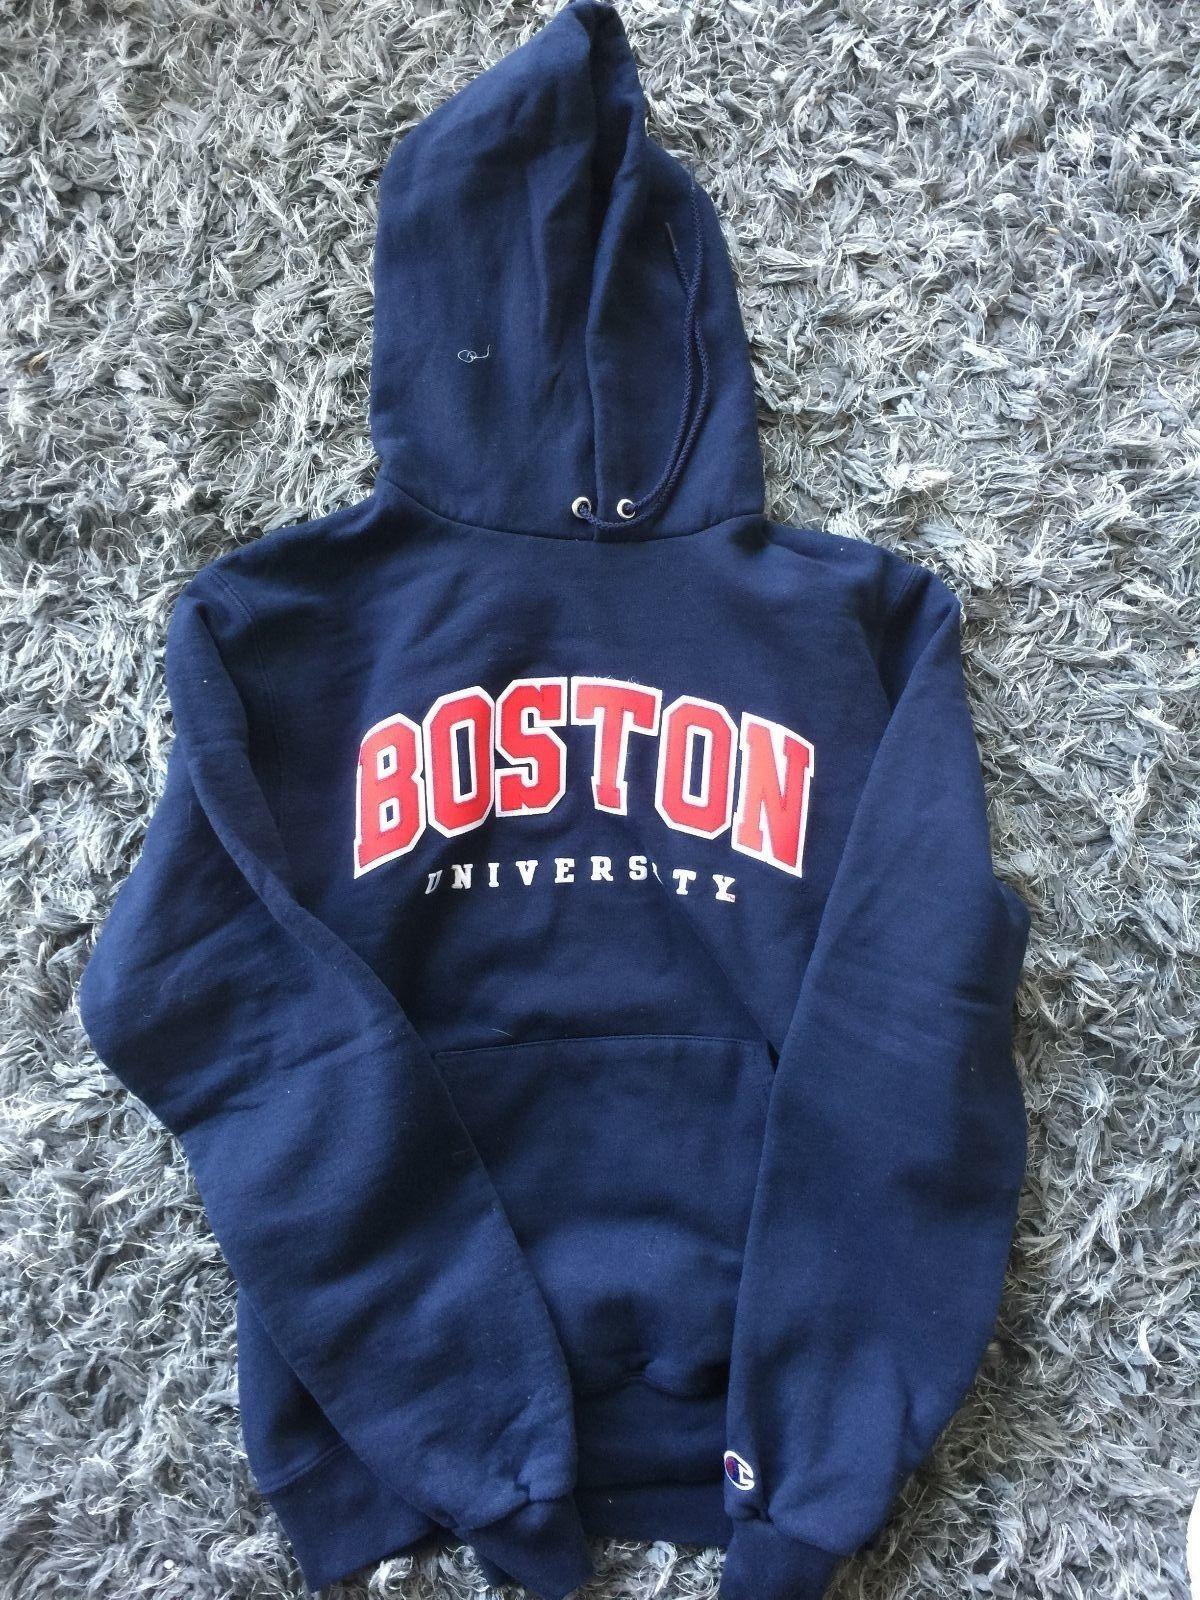 093133a0c330 VTG Boston University Blue Champion Reverse Weave Hoodie Sweatshirt Mens S